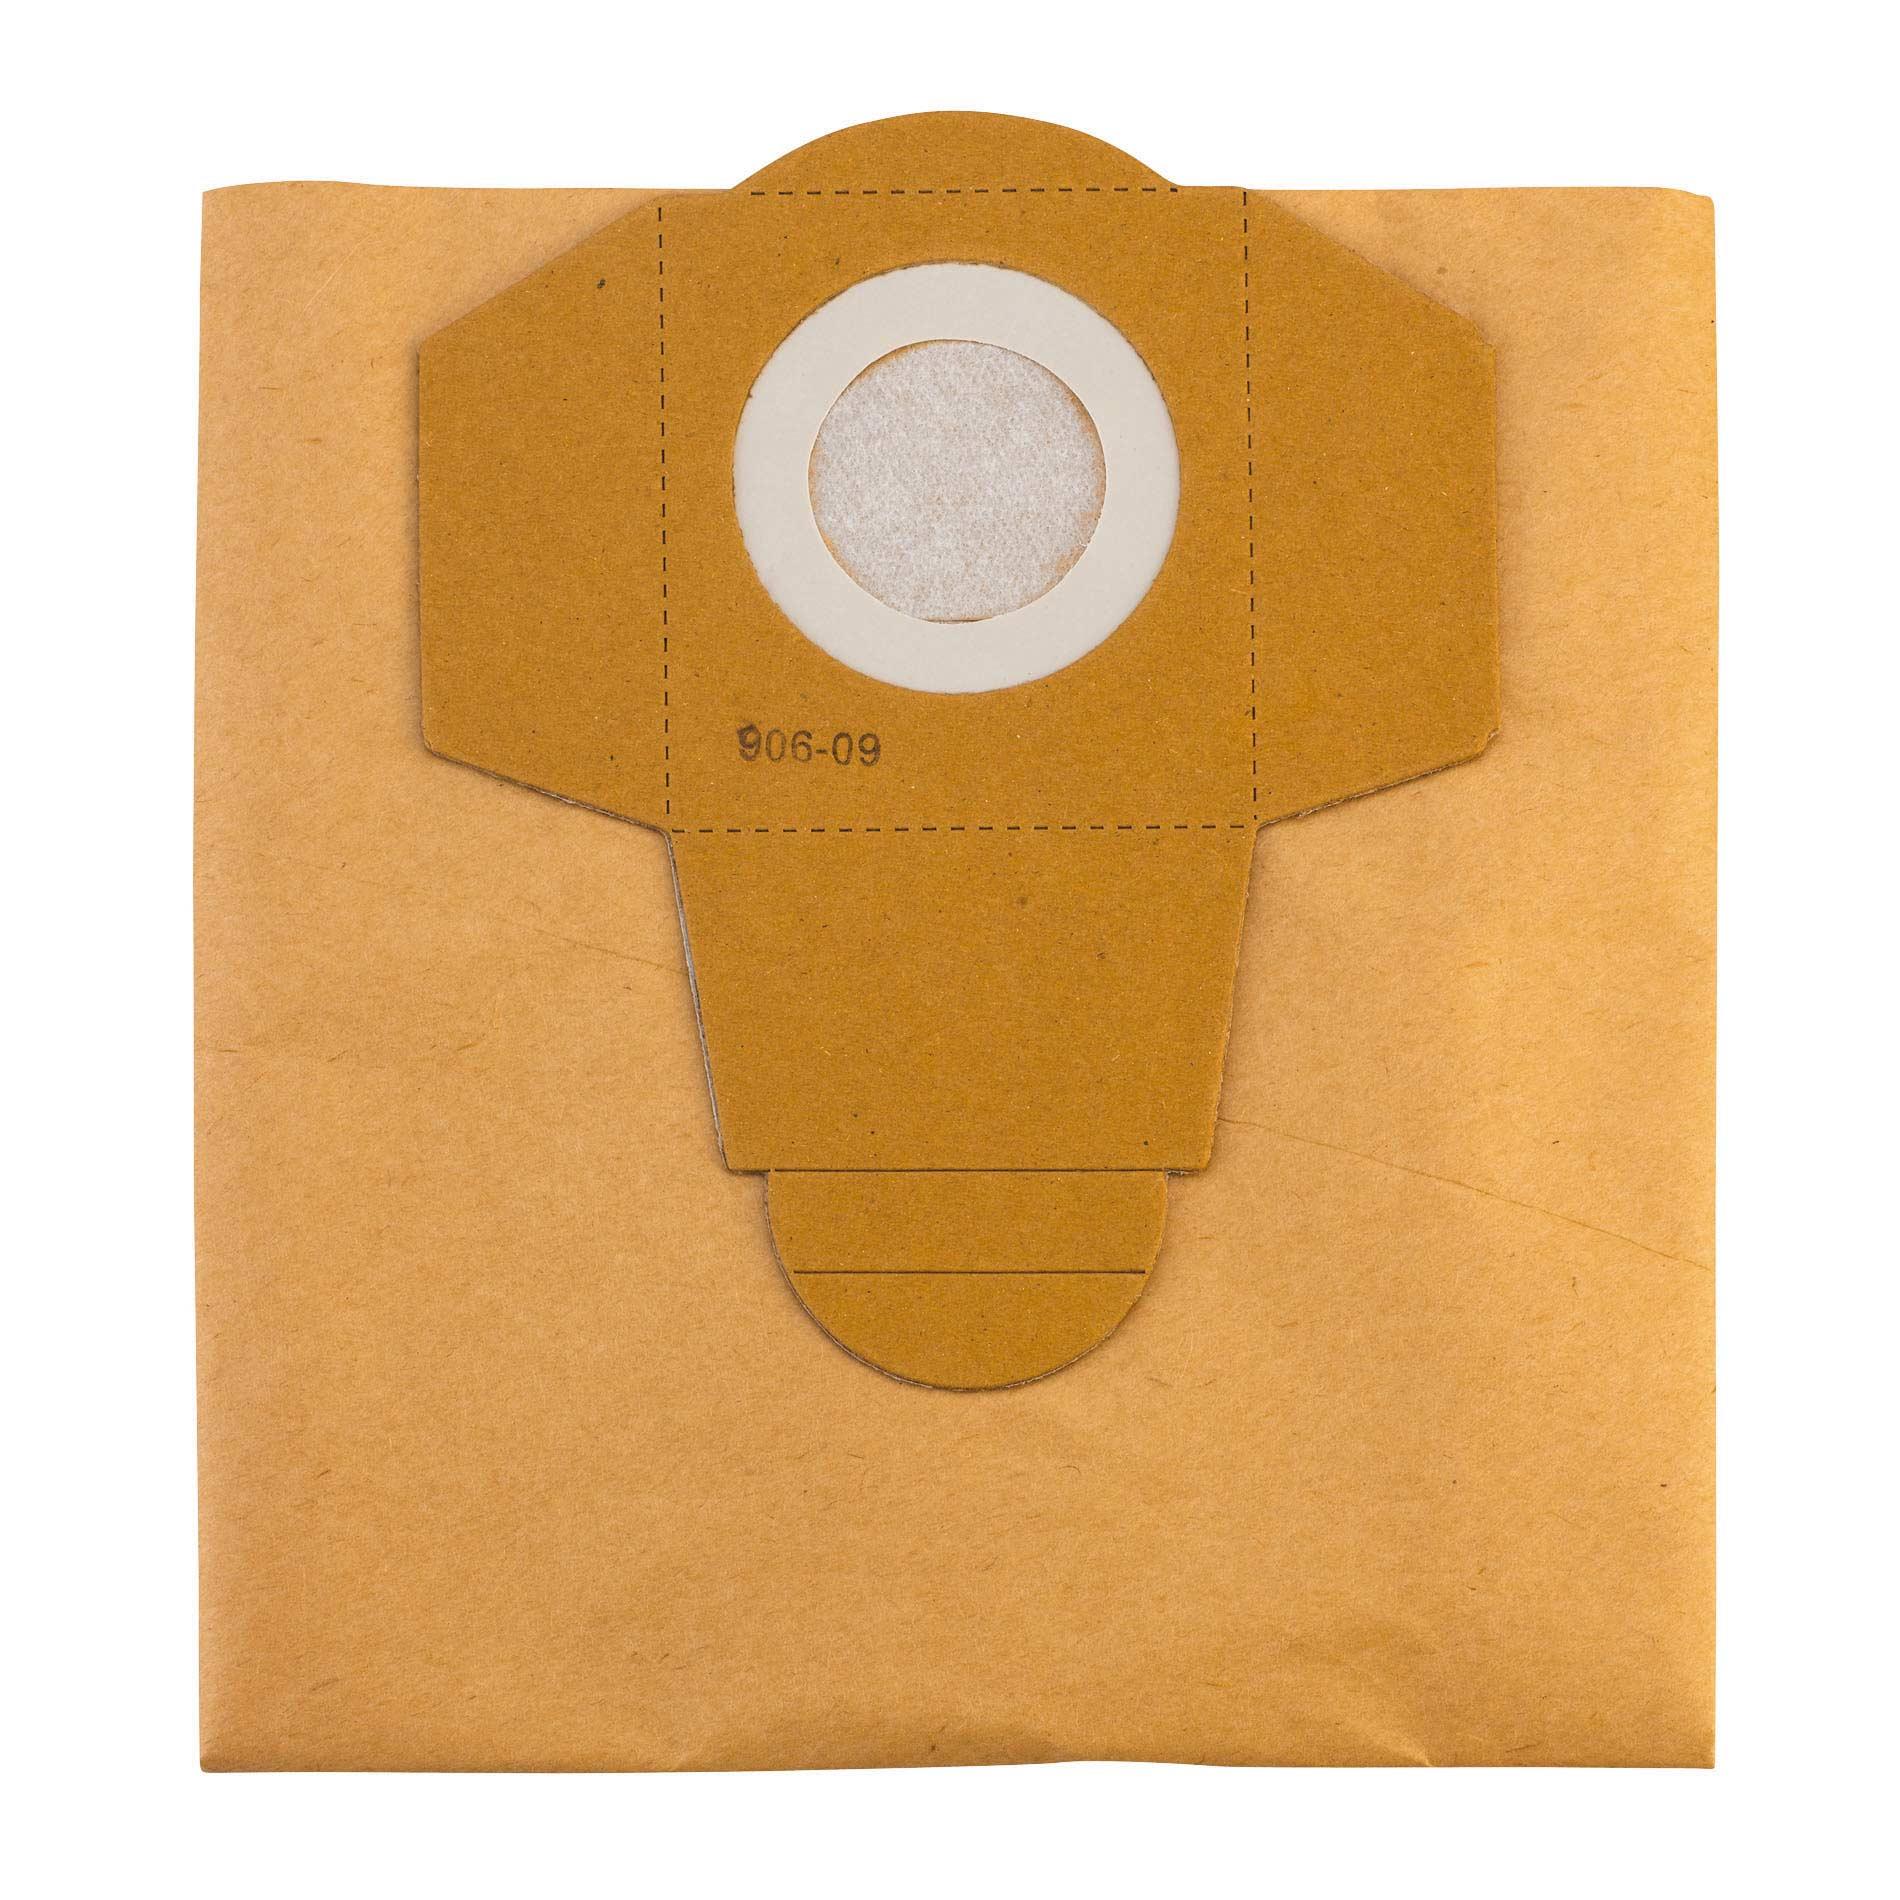 Einhell Schmutzfangsack 25Liter 5 Stück Bild 1